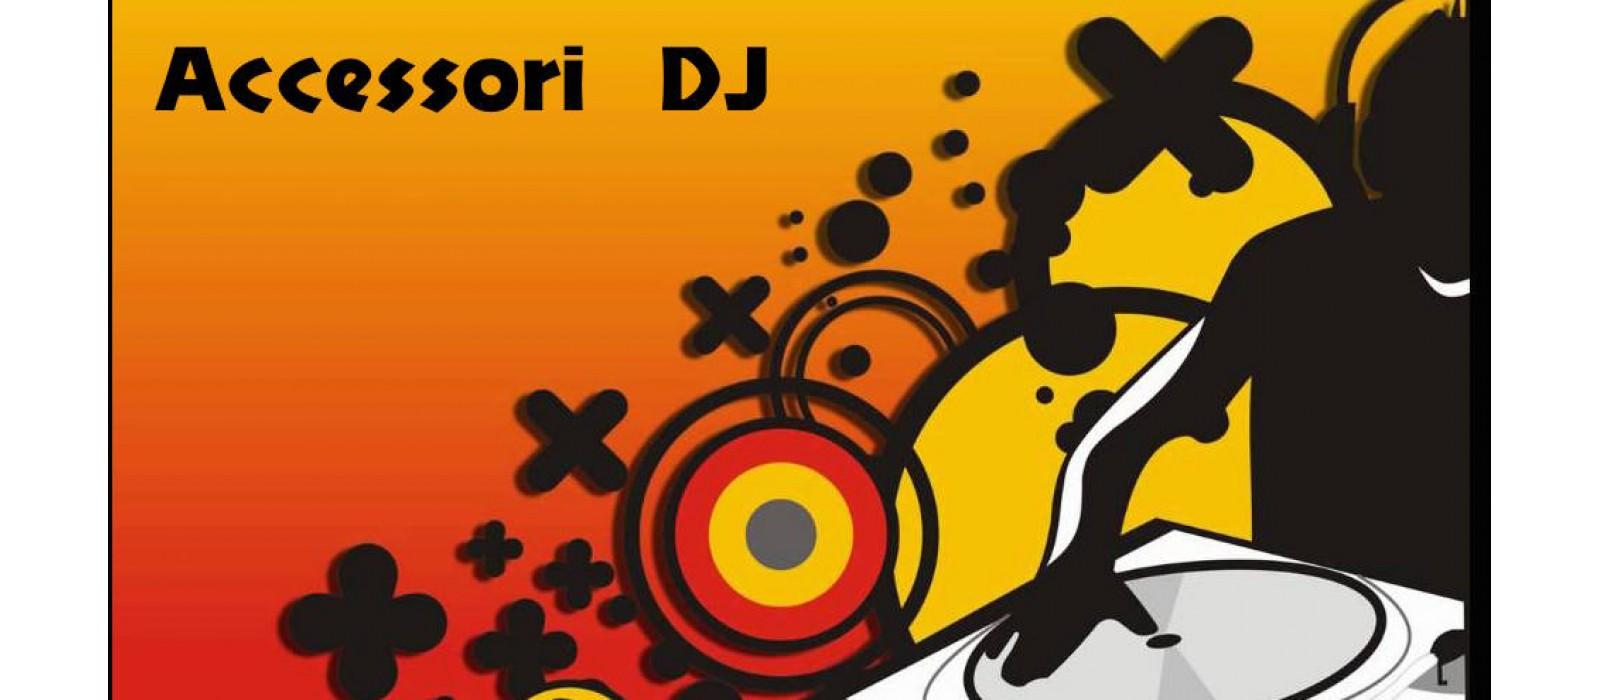 Accessori DJ